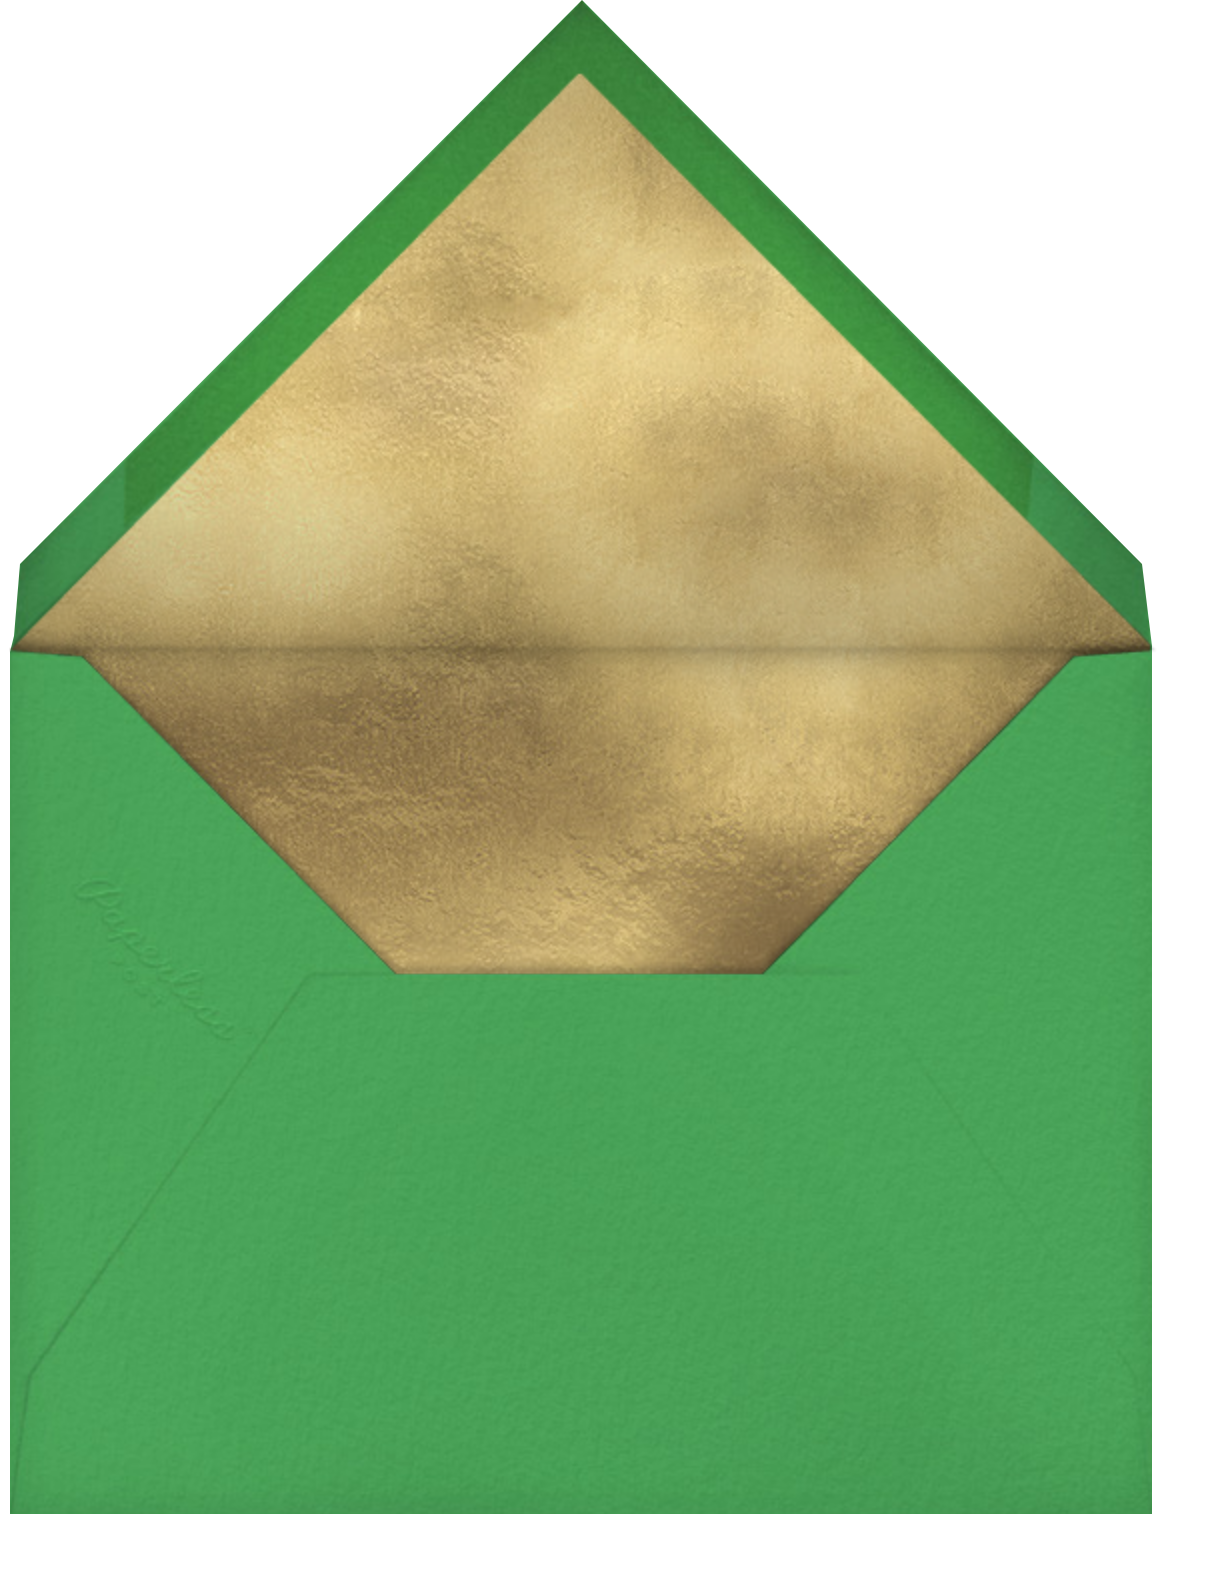 Wrapping Paper Photo - Maraschino - kate spade new york - Christmas - envelope back